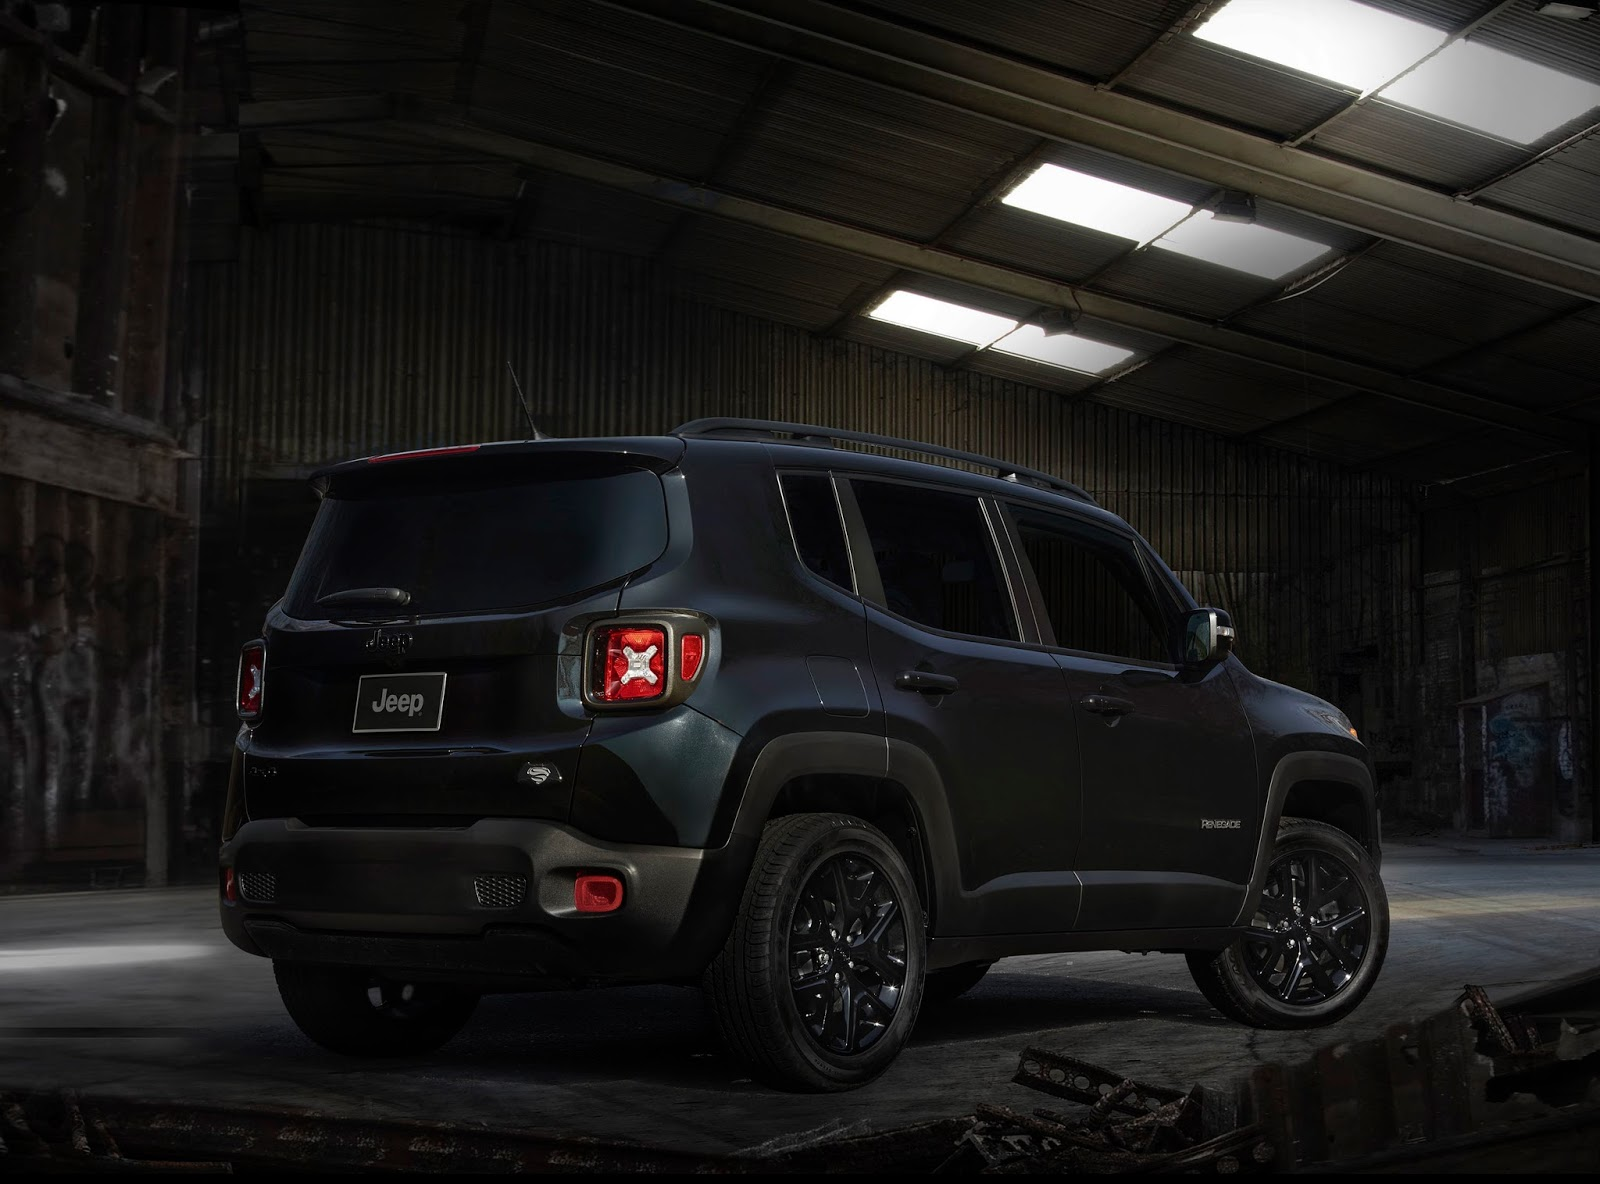 2016 jeep renegade dawn of justice 003 1 1 1 Jeep Renegade Justice! Ένα Jeep για ήρωες! Batman vs Superman, compact SUV, Jeep, Jeep Renegade, Jeep Renegade Justice